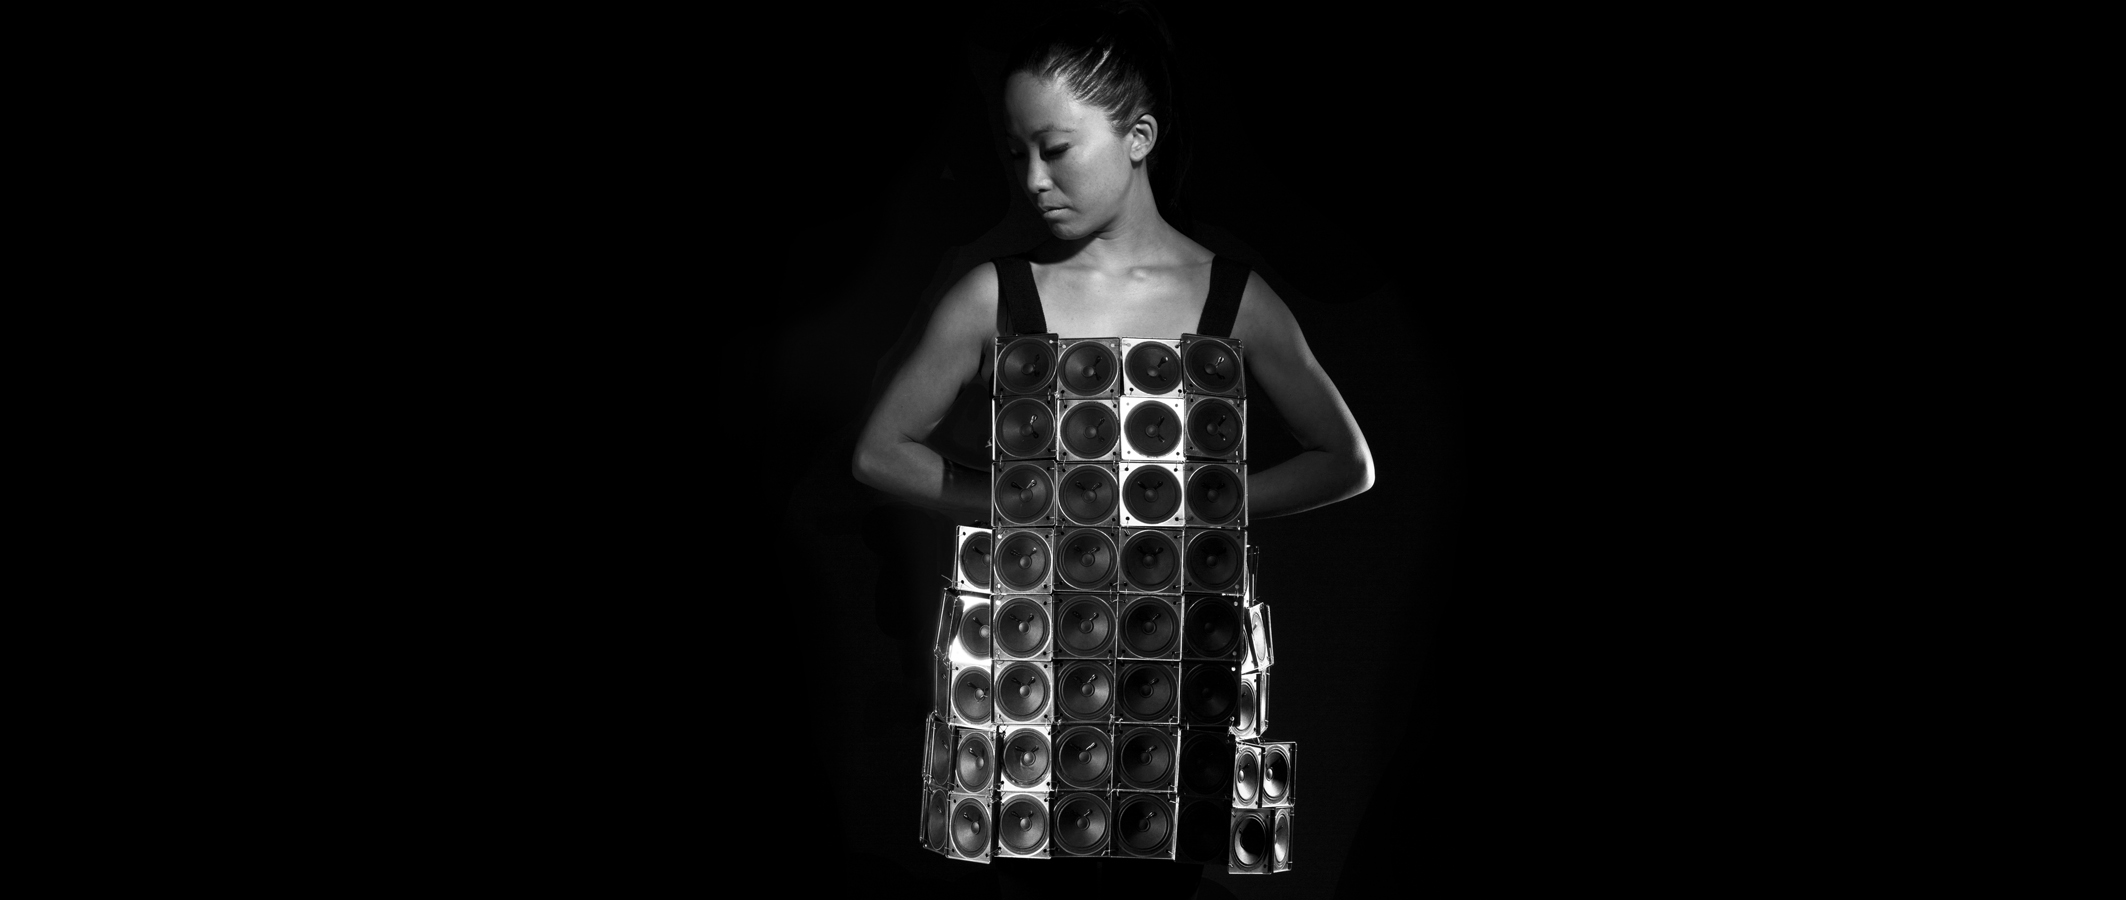 The Speaker Dress Self Designed Wearable Sound Sculpture  Photo by Juan Pablo Aragón  2014